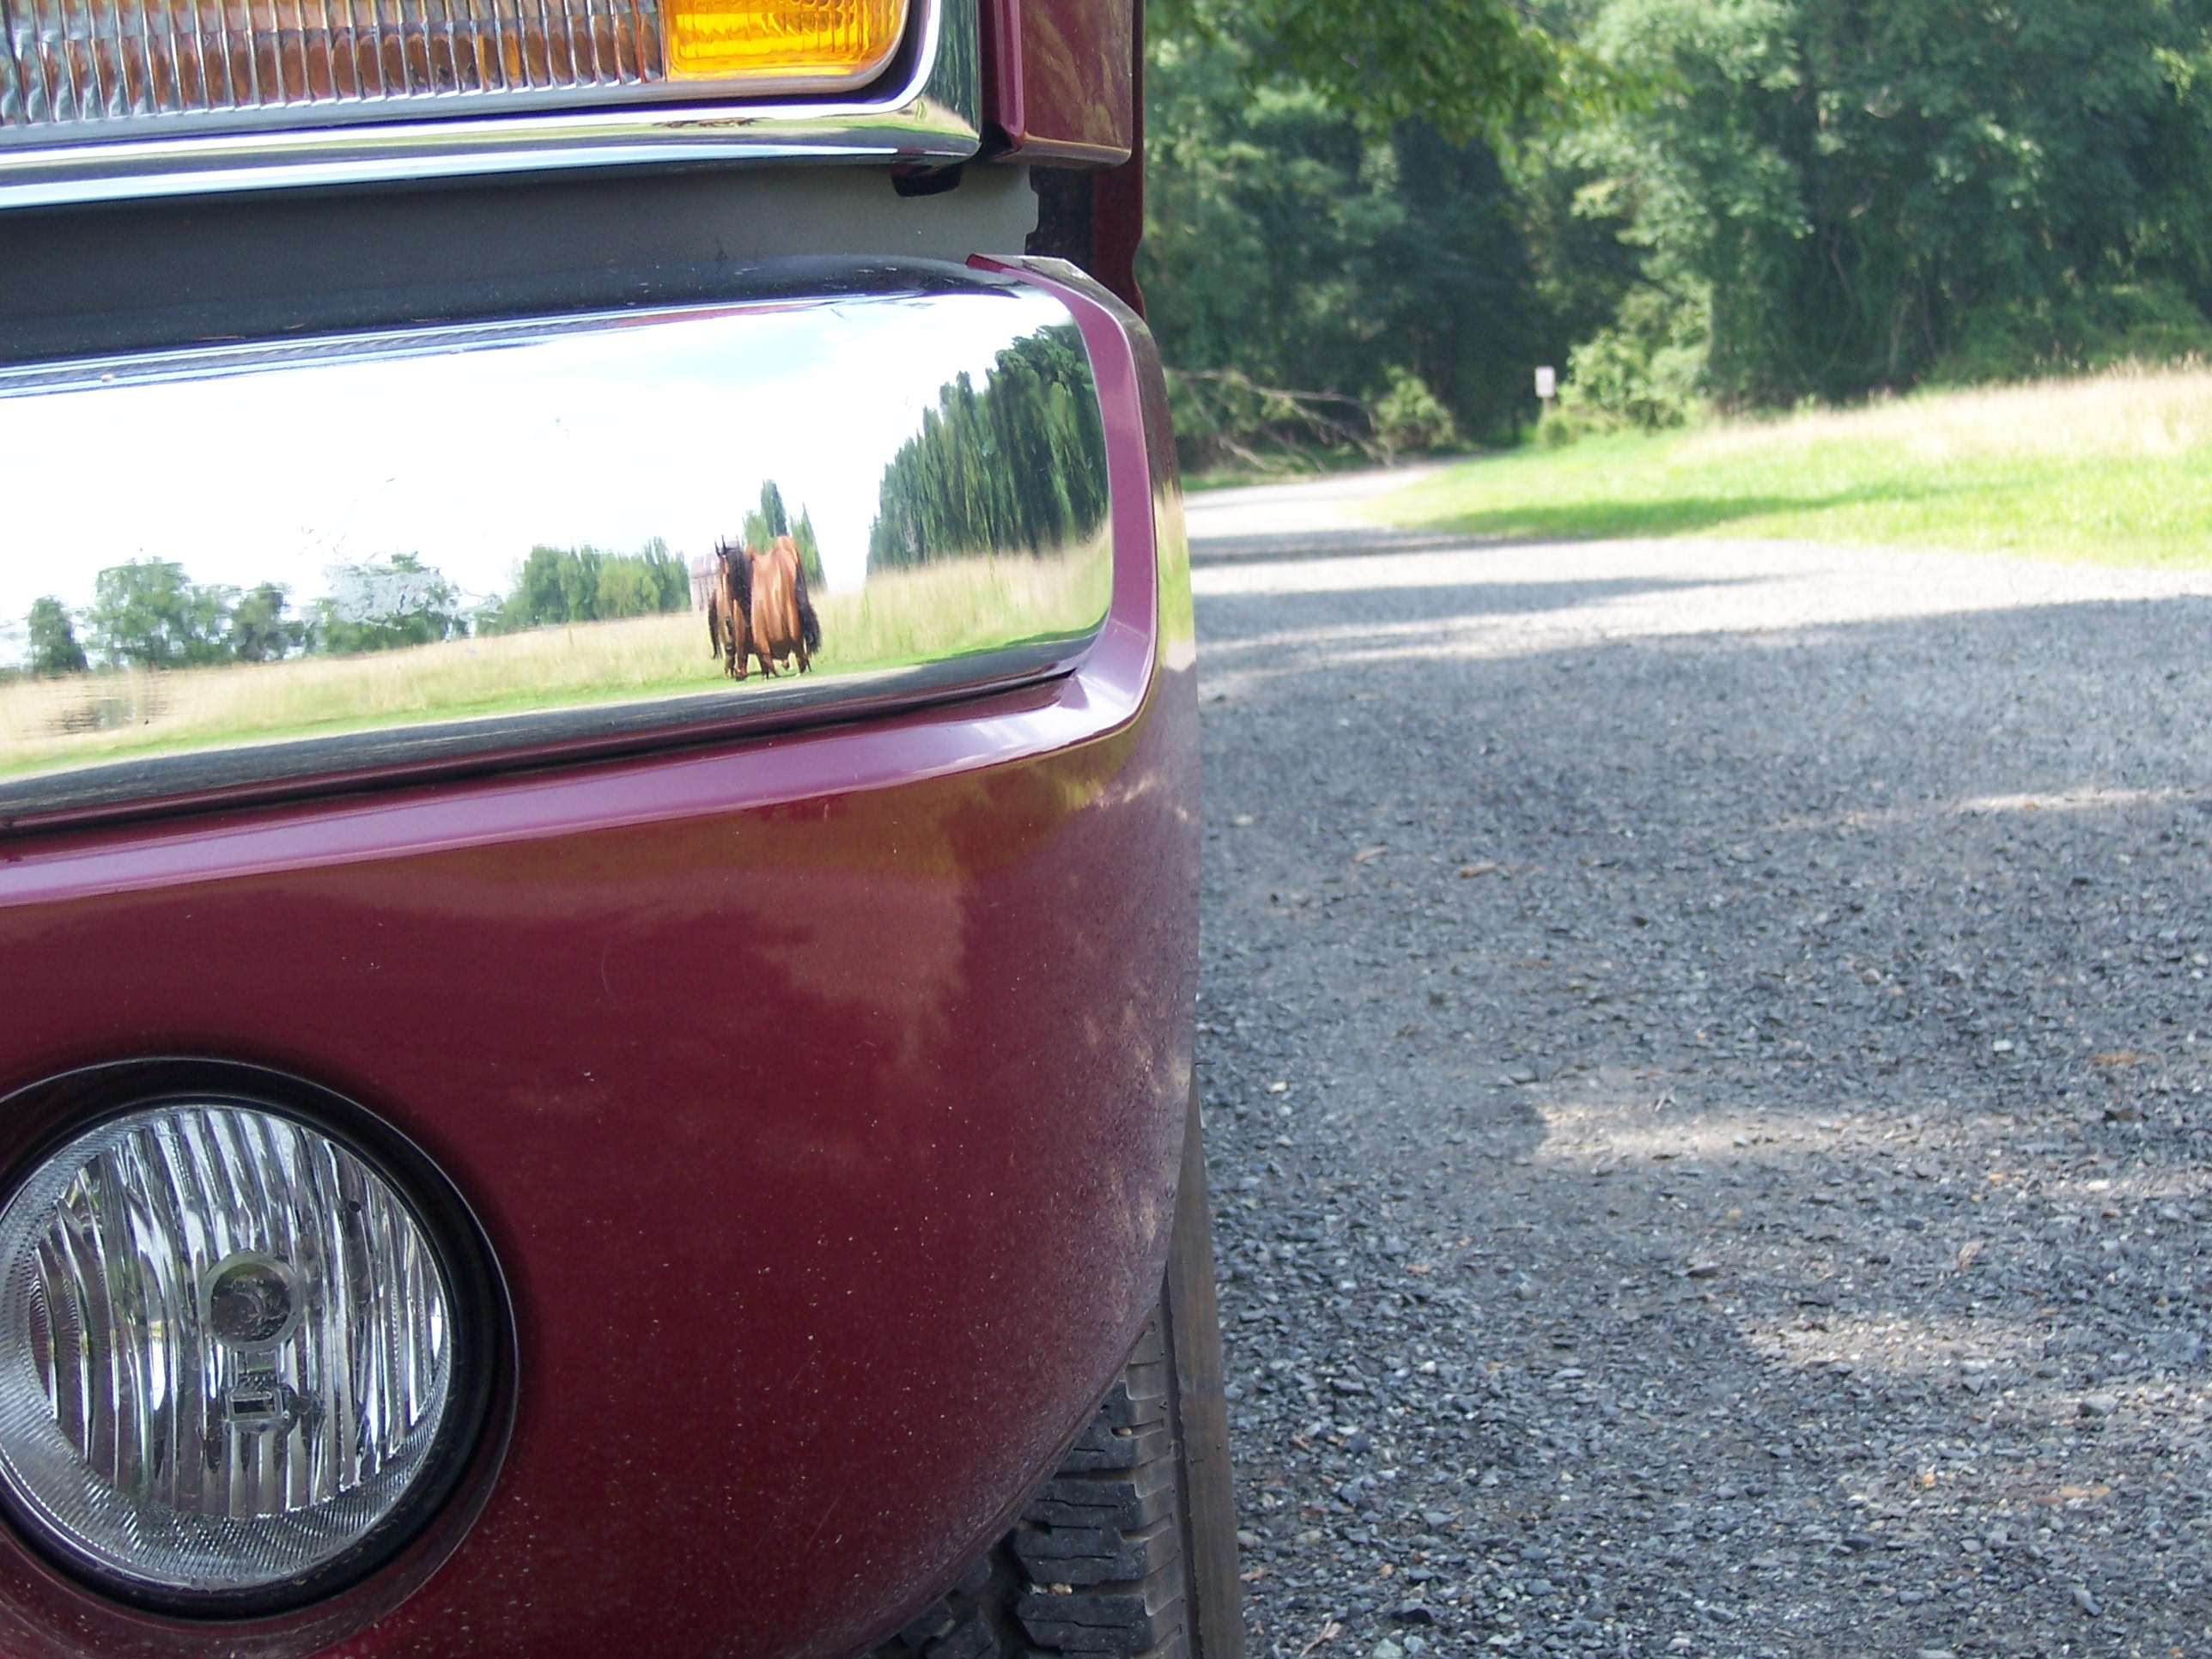 REFLECTION, Bspo06, Bumper, Car, Horse, HQ Photo